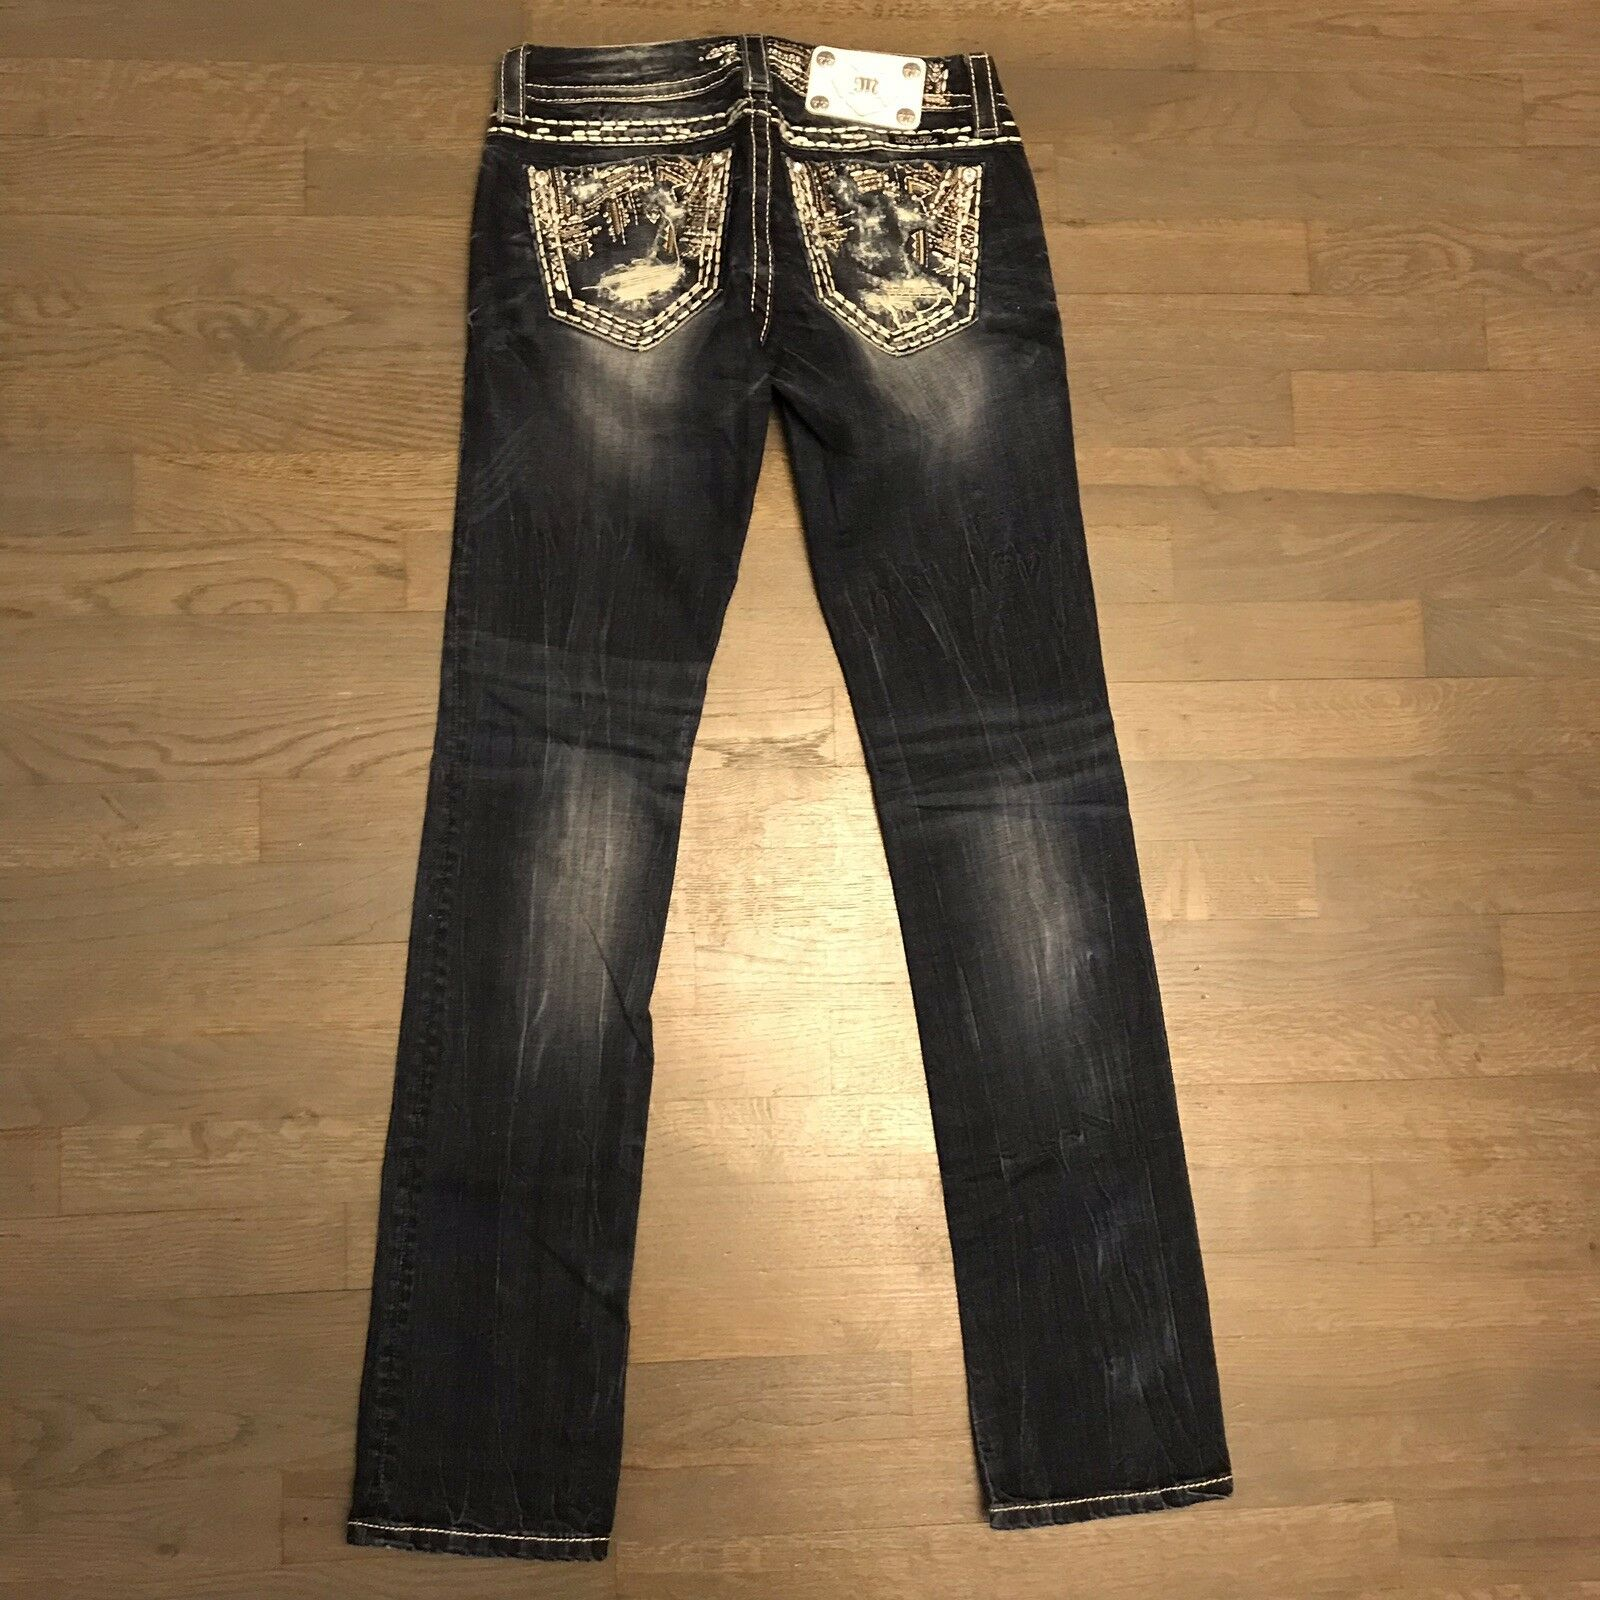 Miss Me Signature Straight Leg Studded Stretch Denim Jeans Woman's Size 26